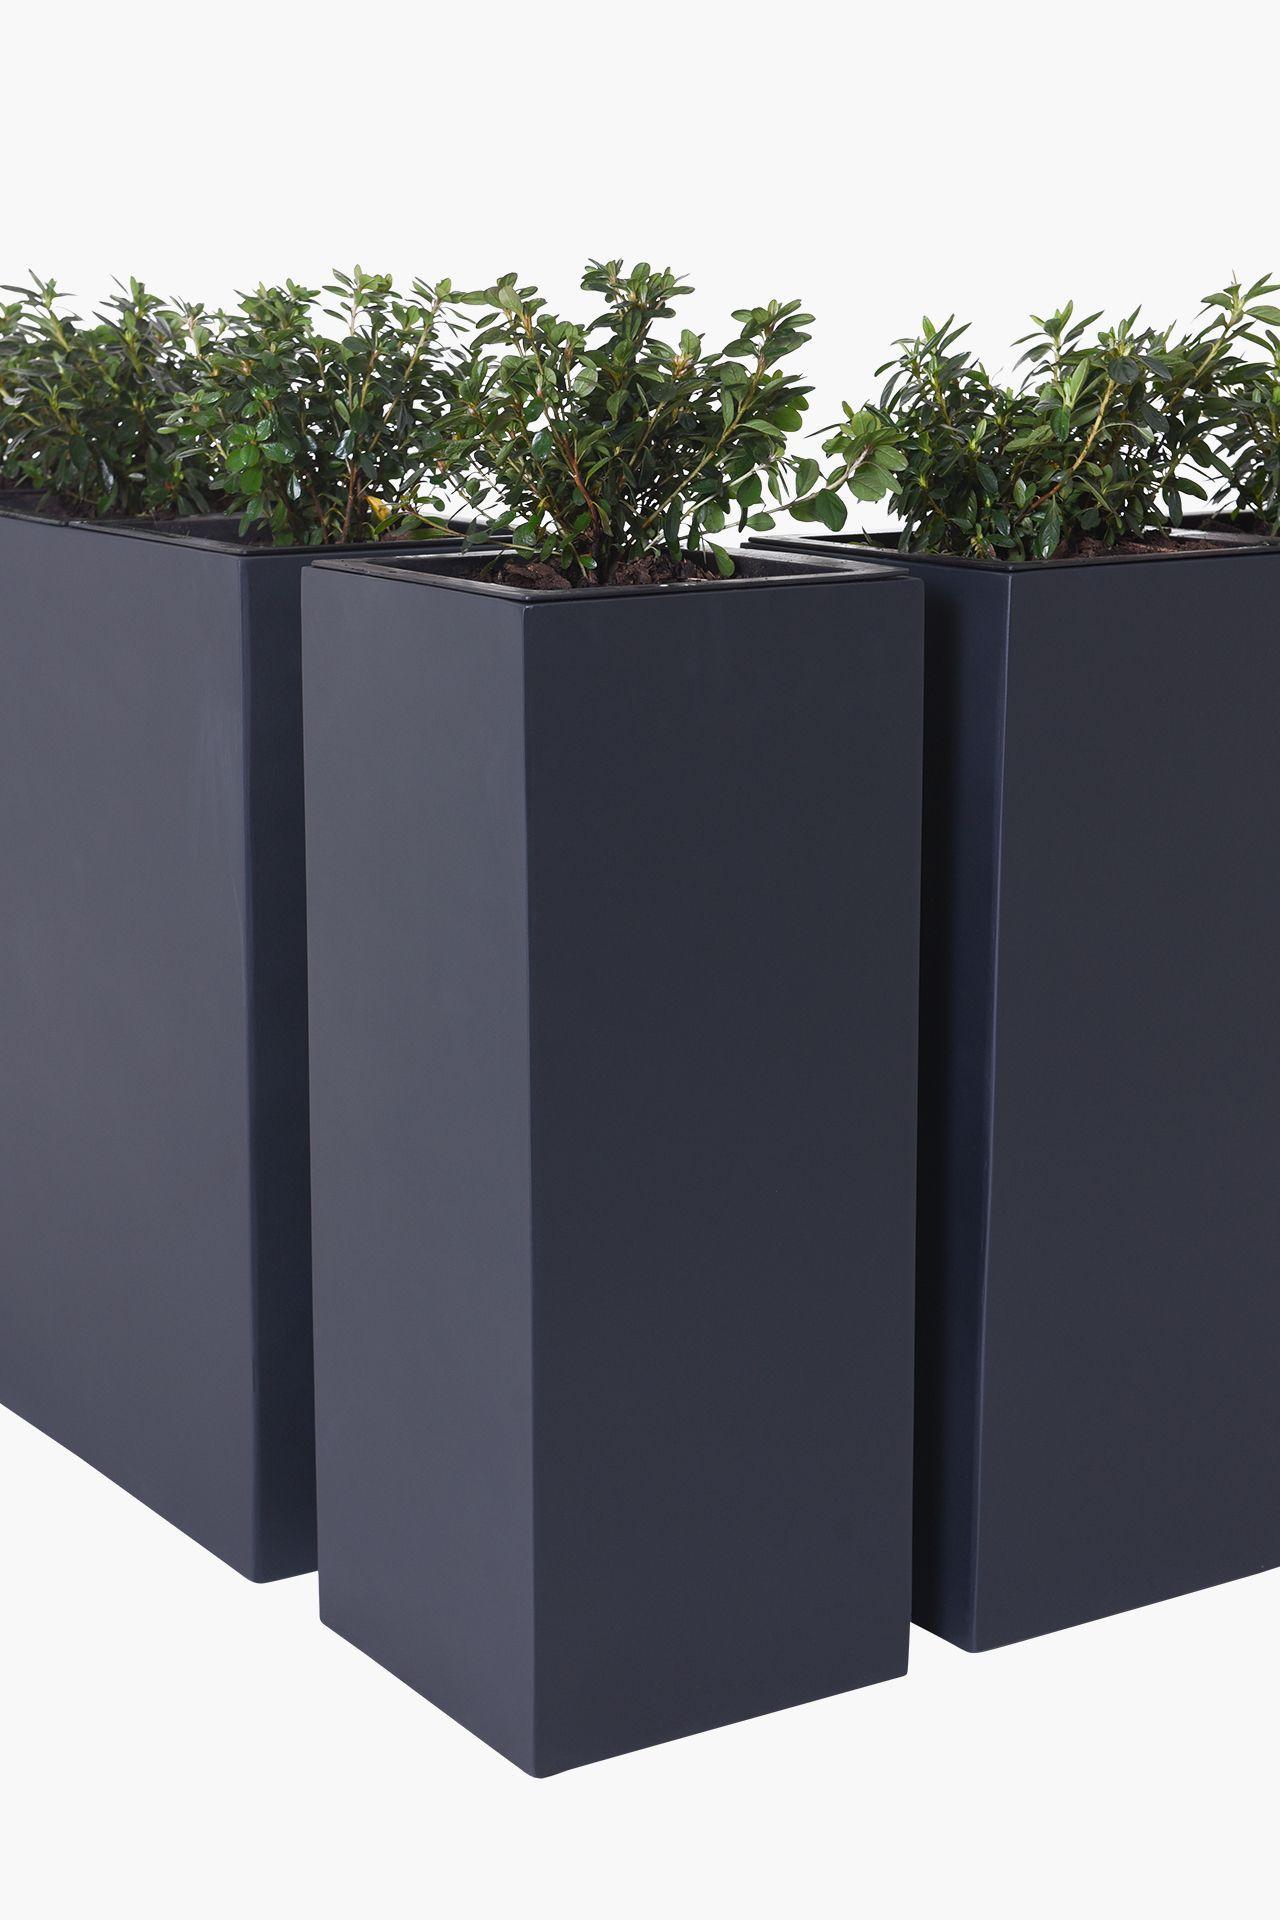 Pflanzkubel Raumteiler Eckkombination Fiberglas Corner 75